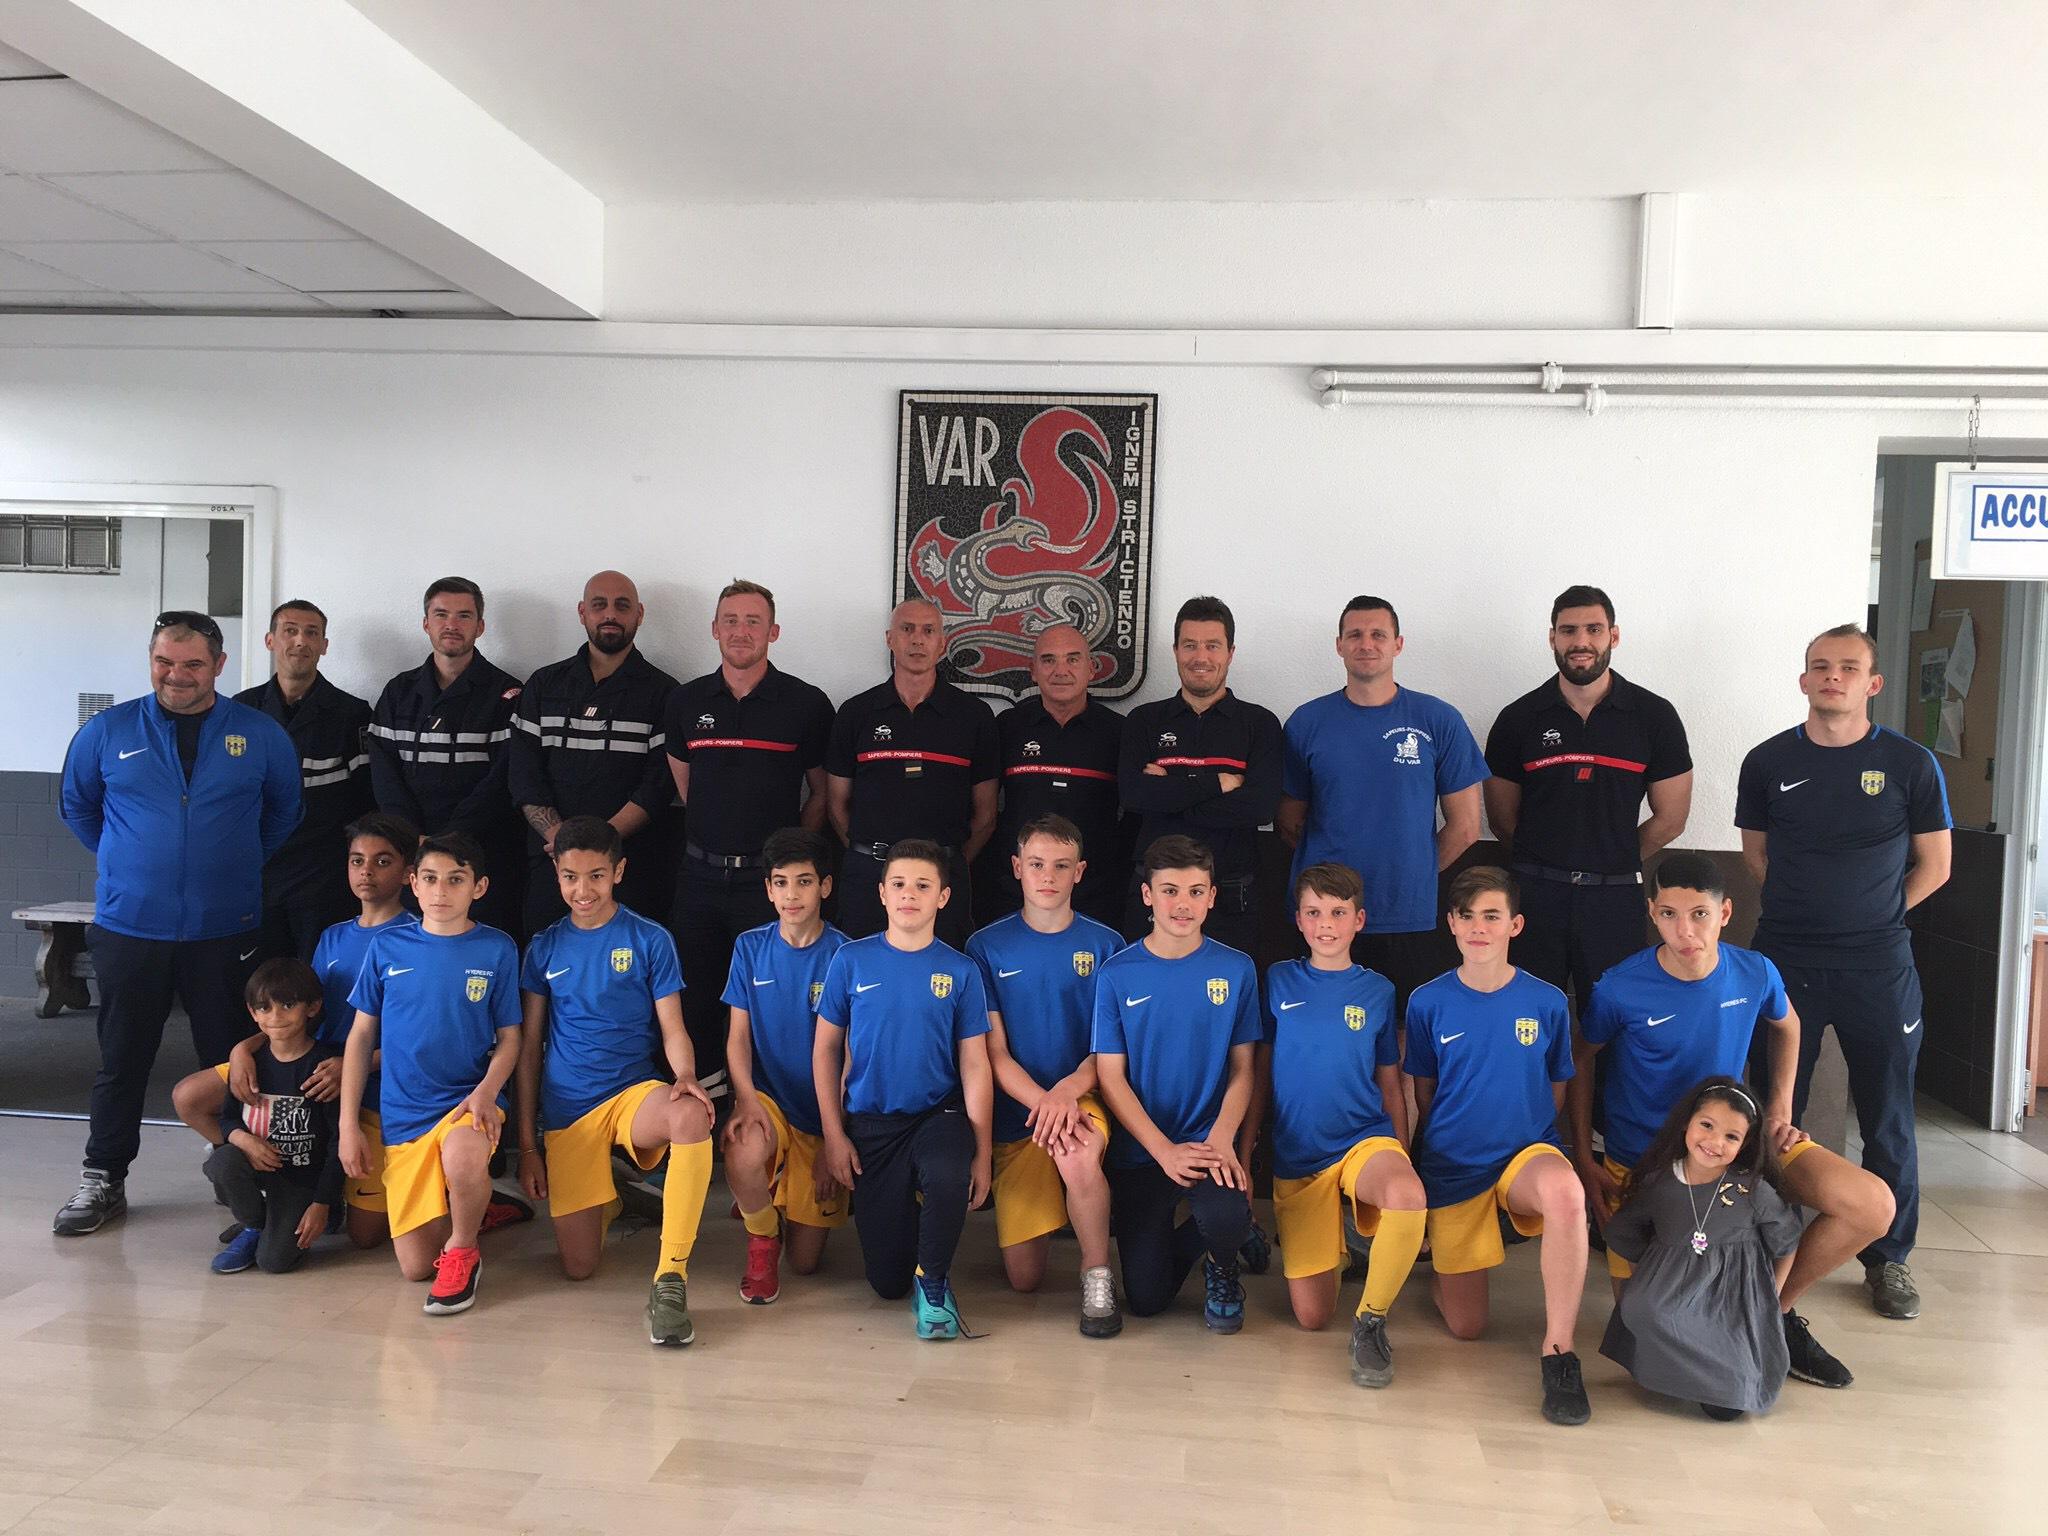 PEF Avril 2019 chez les pompiers (2).JPG